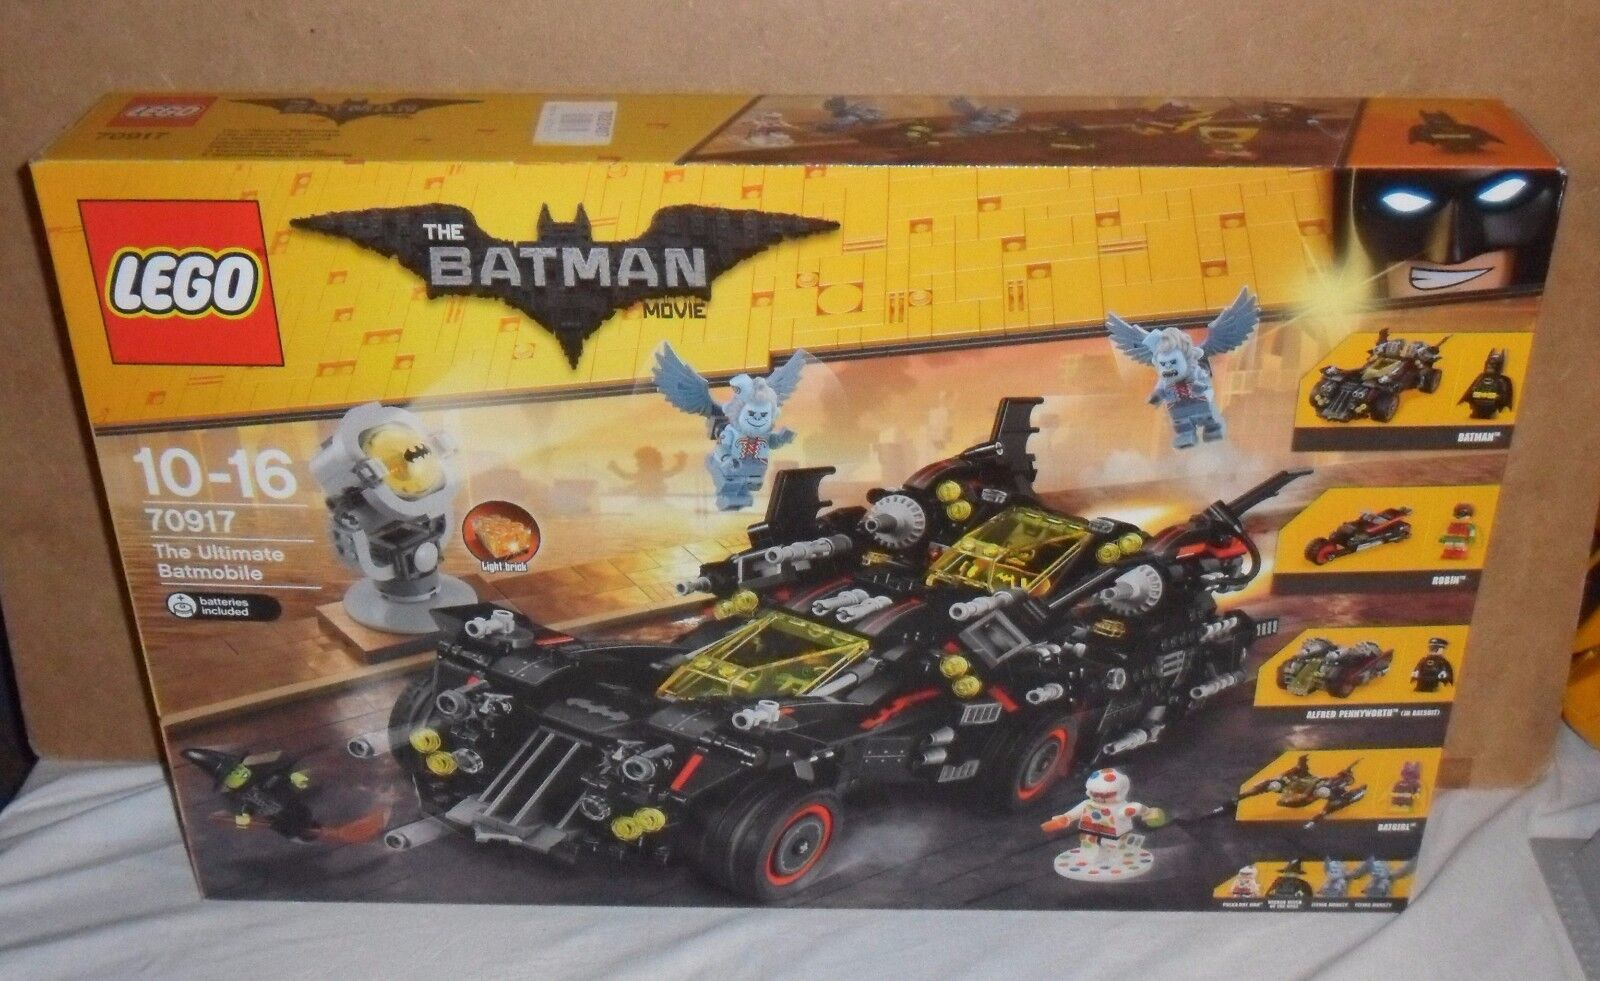 LEGO The Batman Movie - 70917 The Ultimate Batmobile  -  Unopened